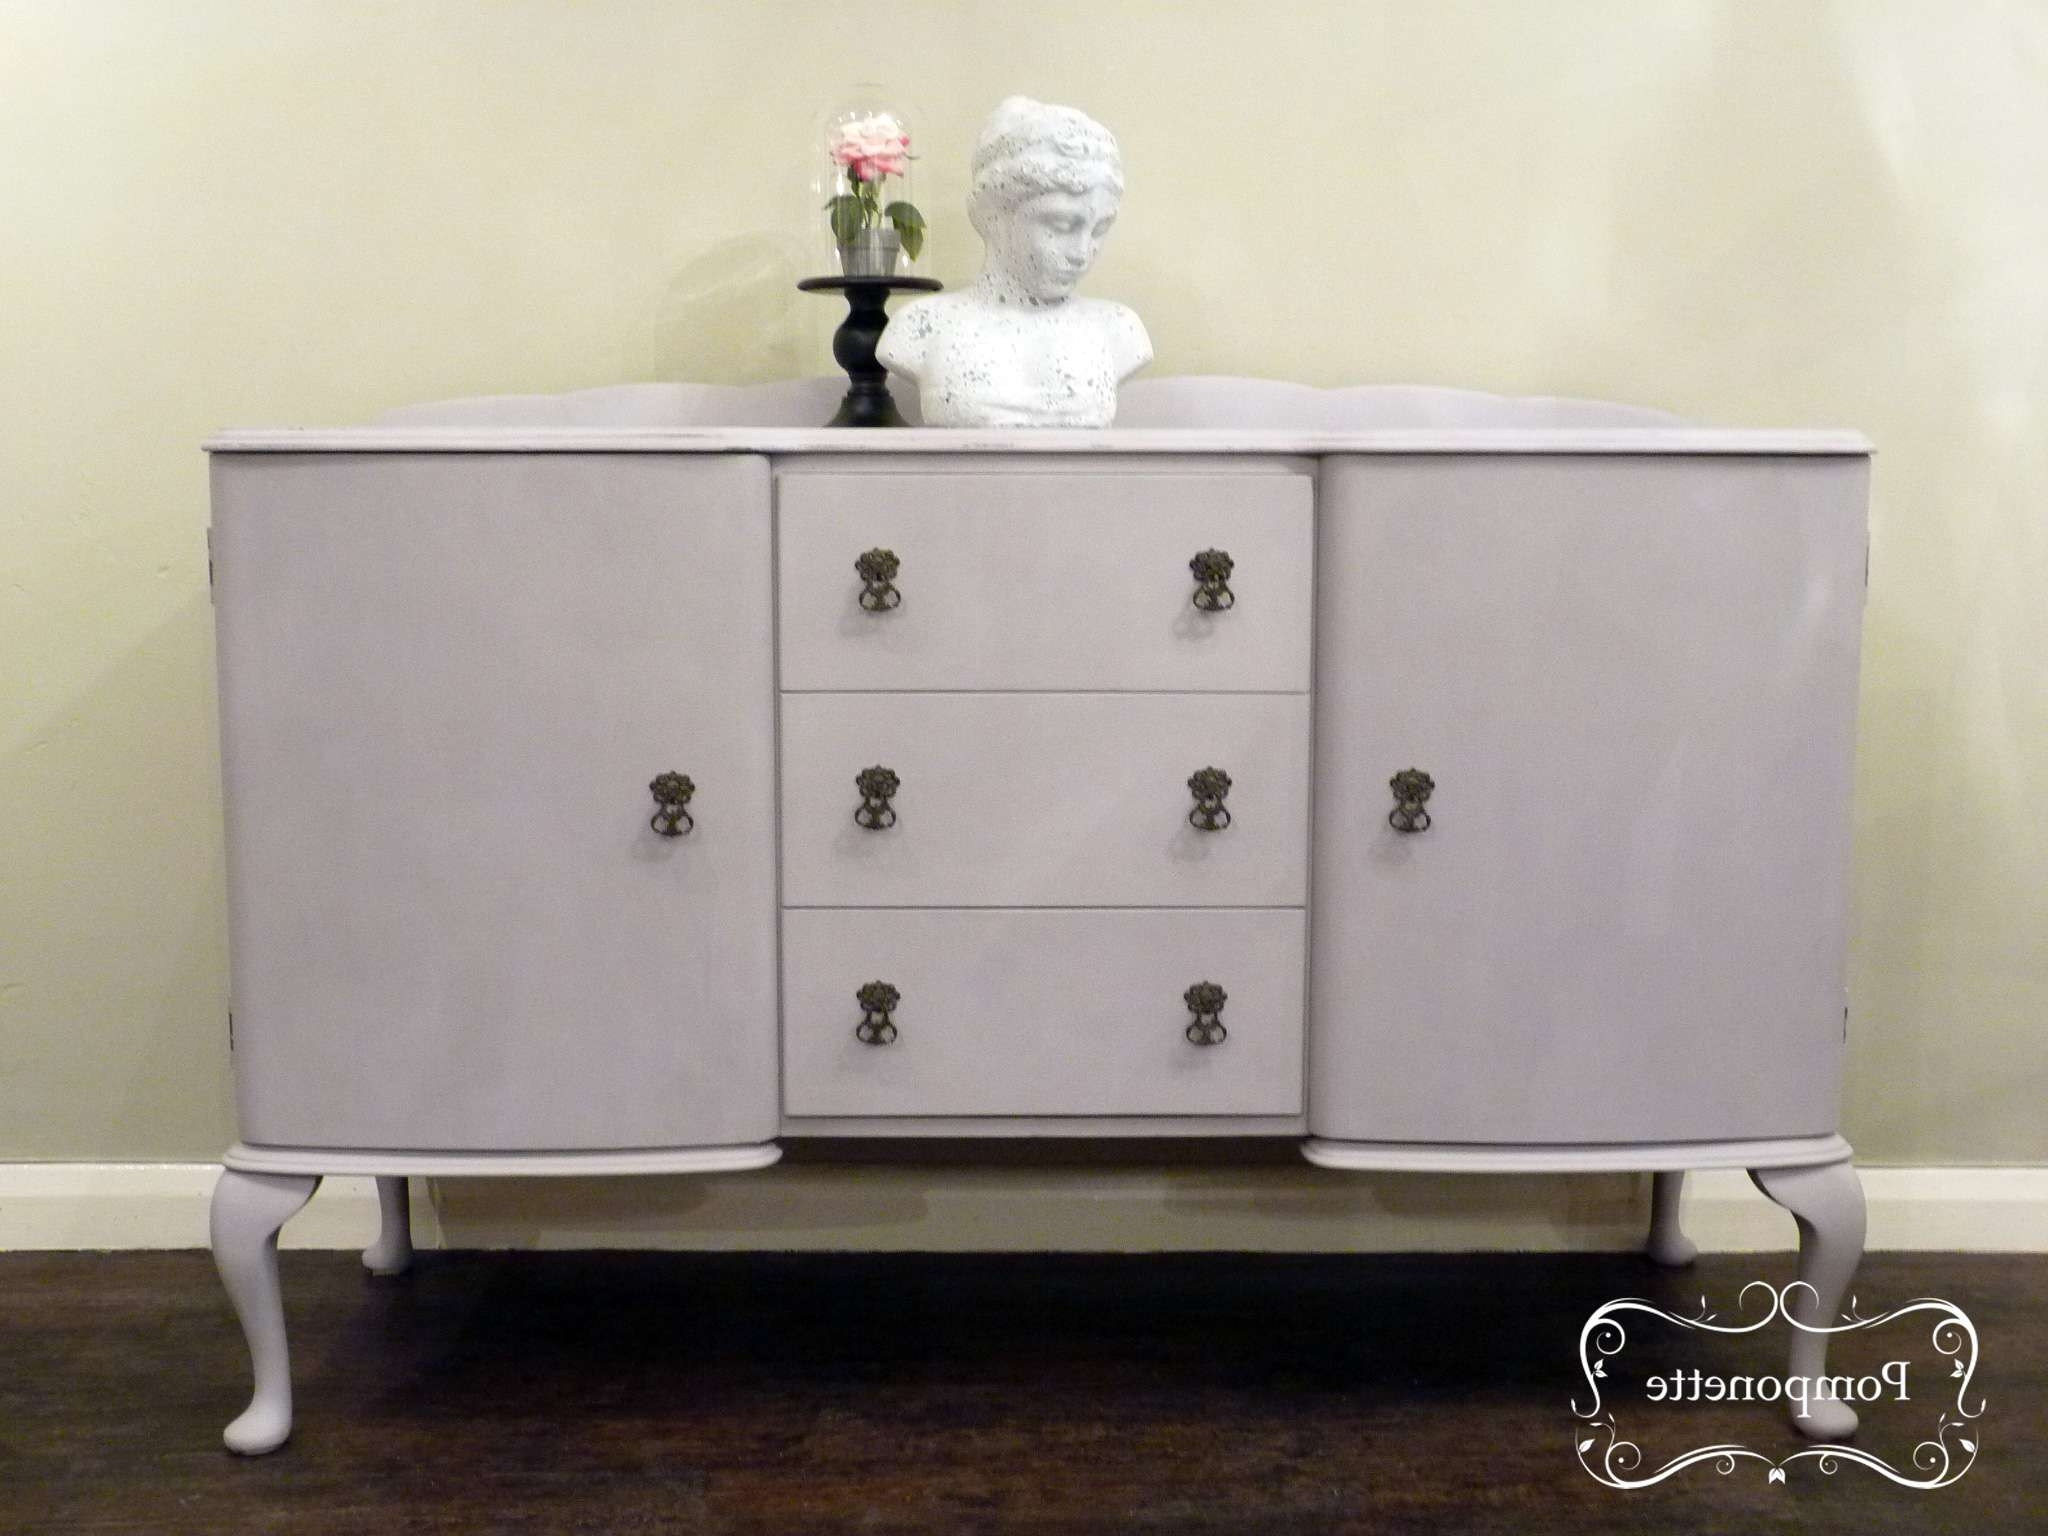 Sideboardpomponette|Vintage Painted Furniture Regarding Chalk Painted Sideboards (View 18 of 20)